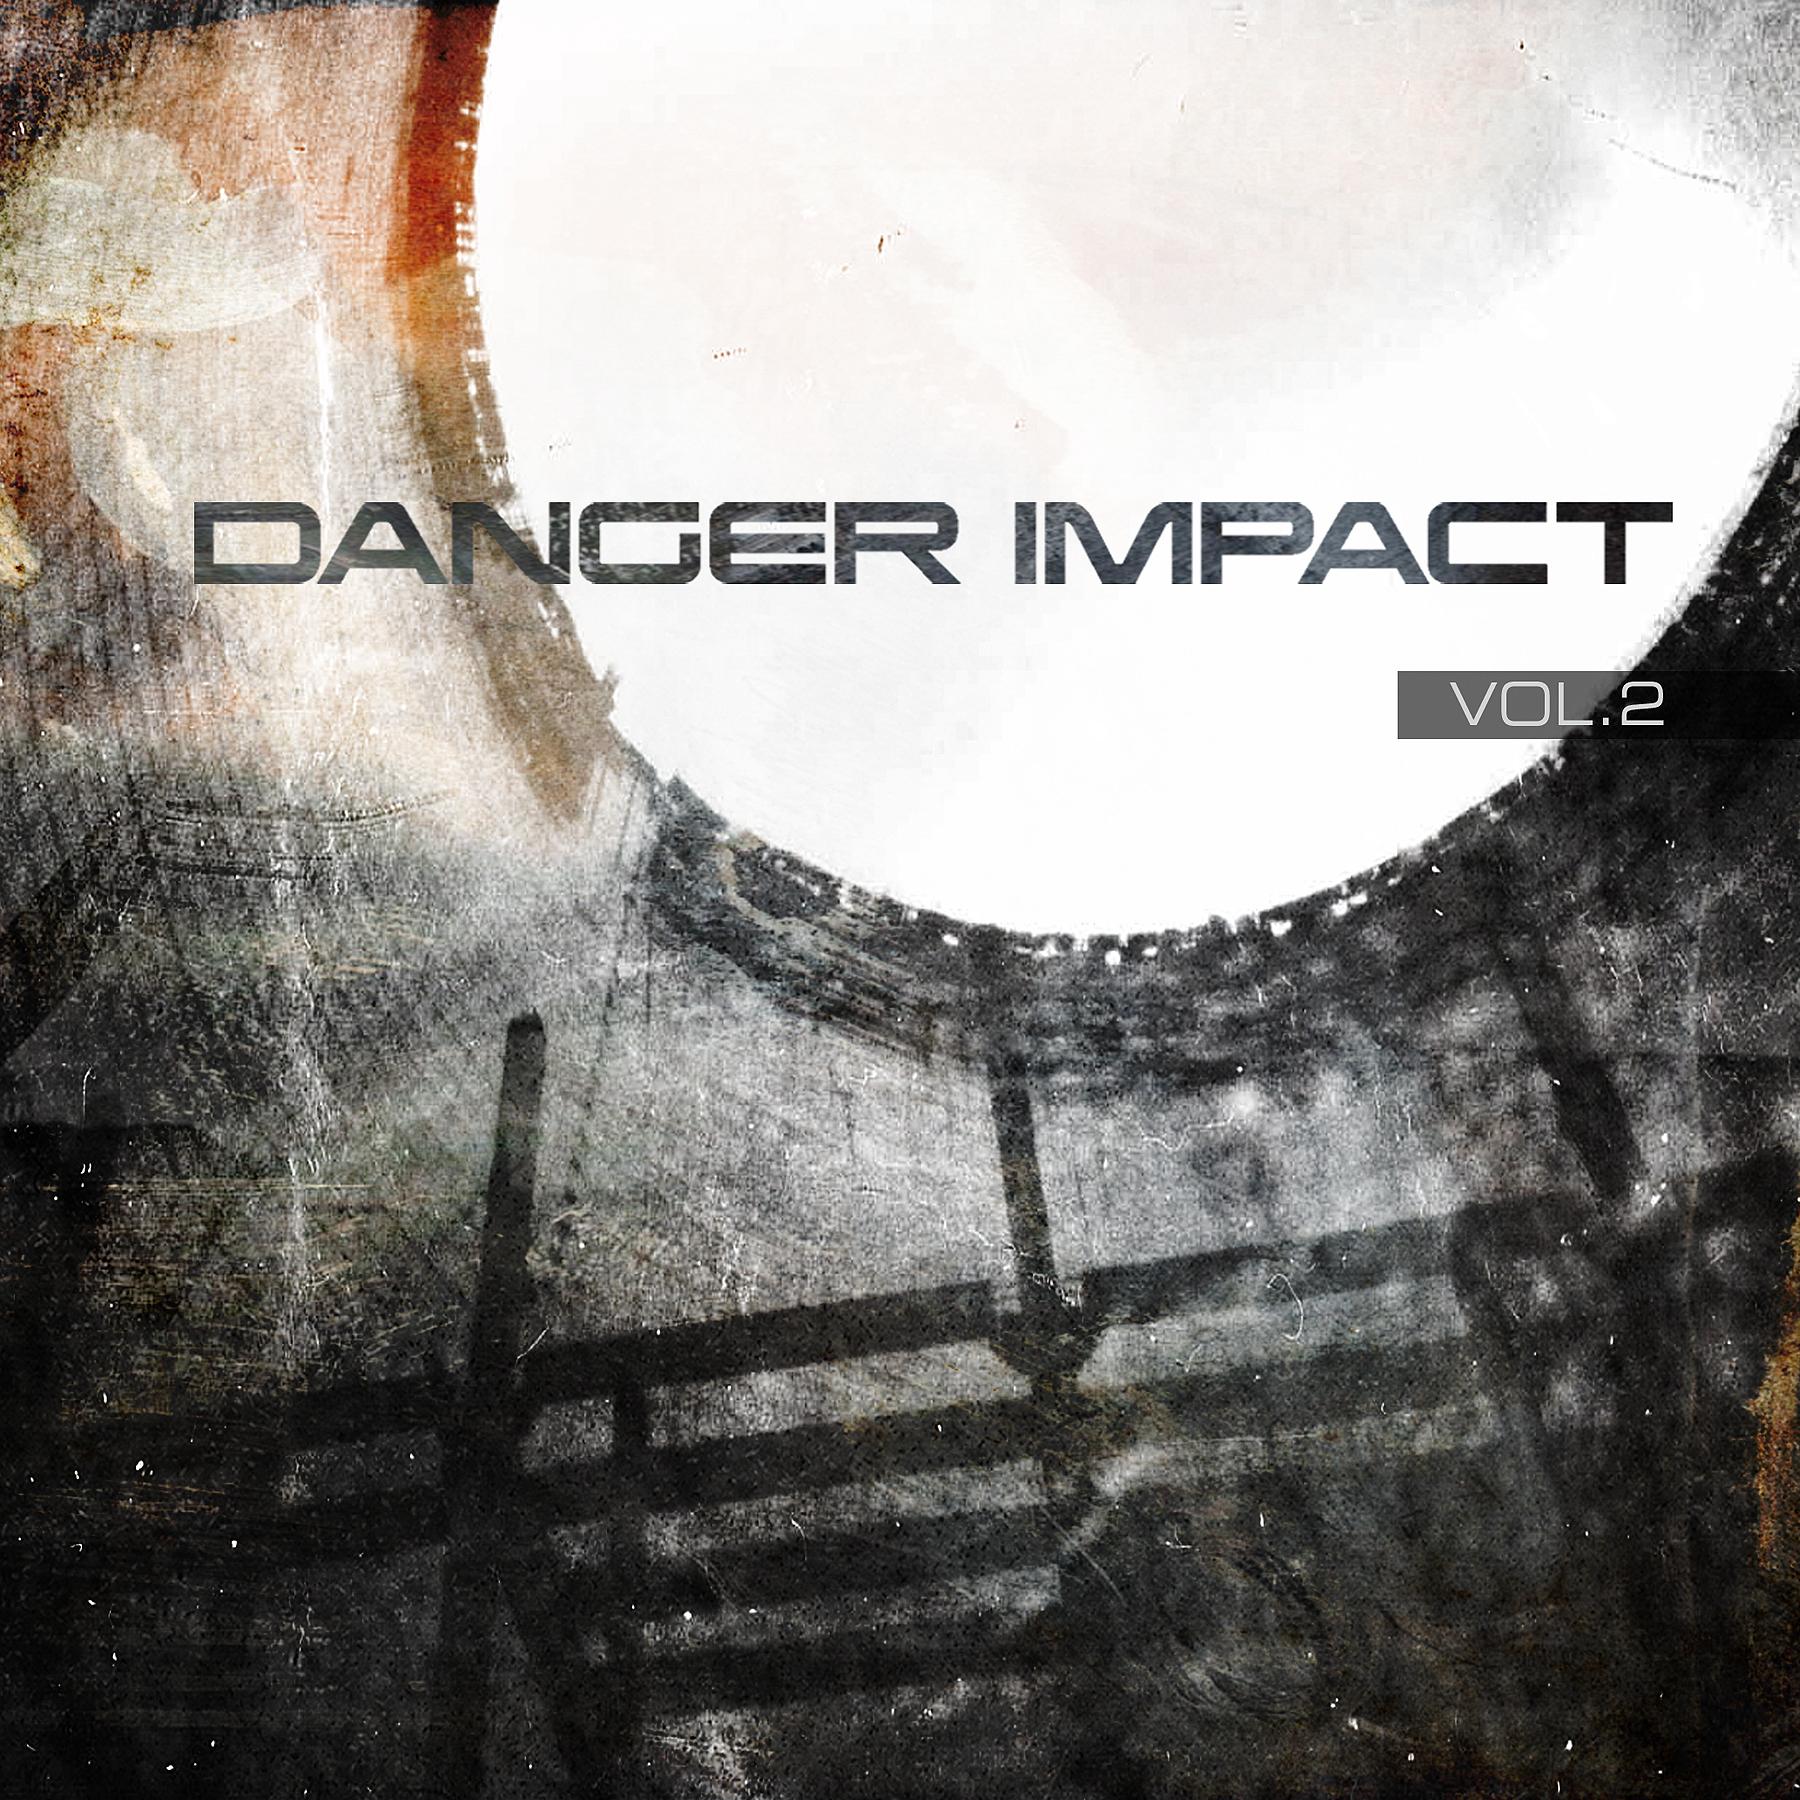 Danger Impact 2